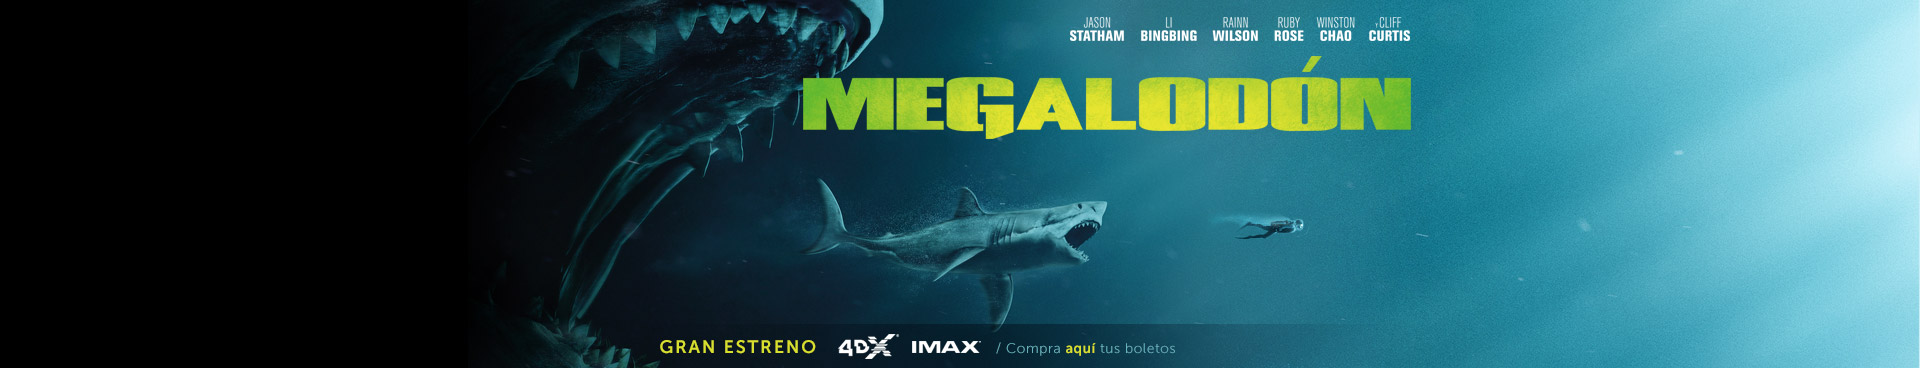 Gran estreno: Megalodón